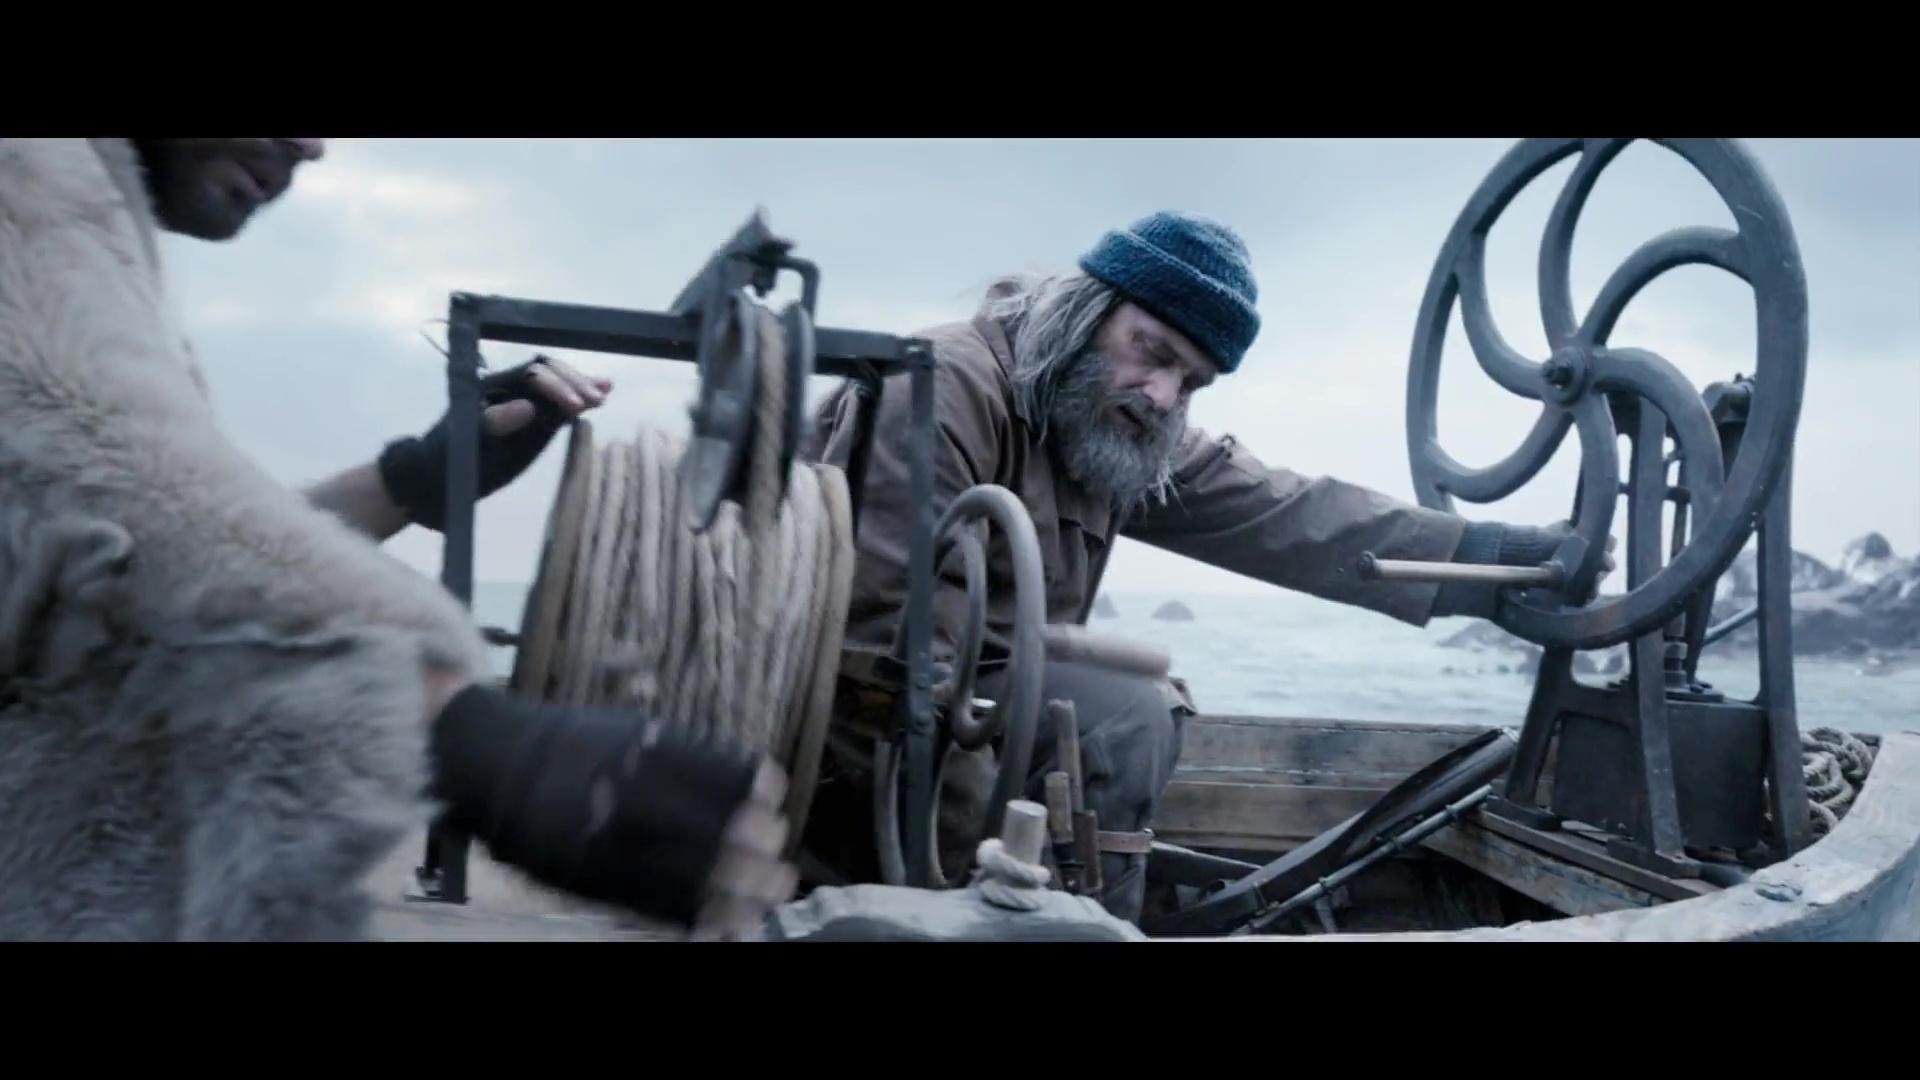 La Piel Fria 1080p Cas-Ing 5.1 (2017)